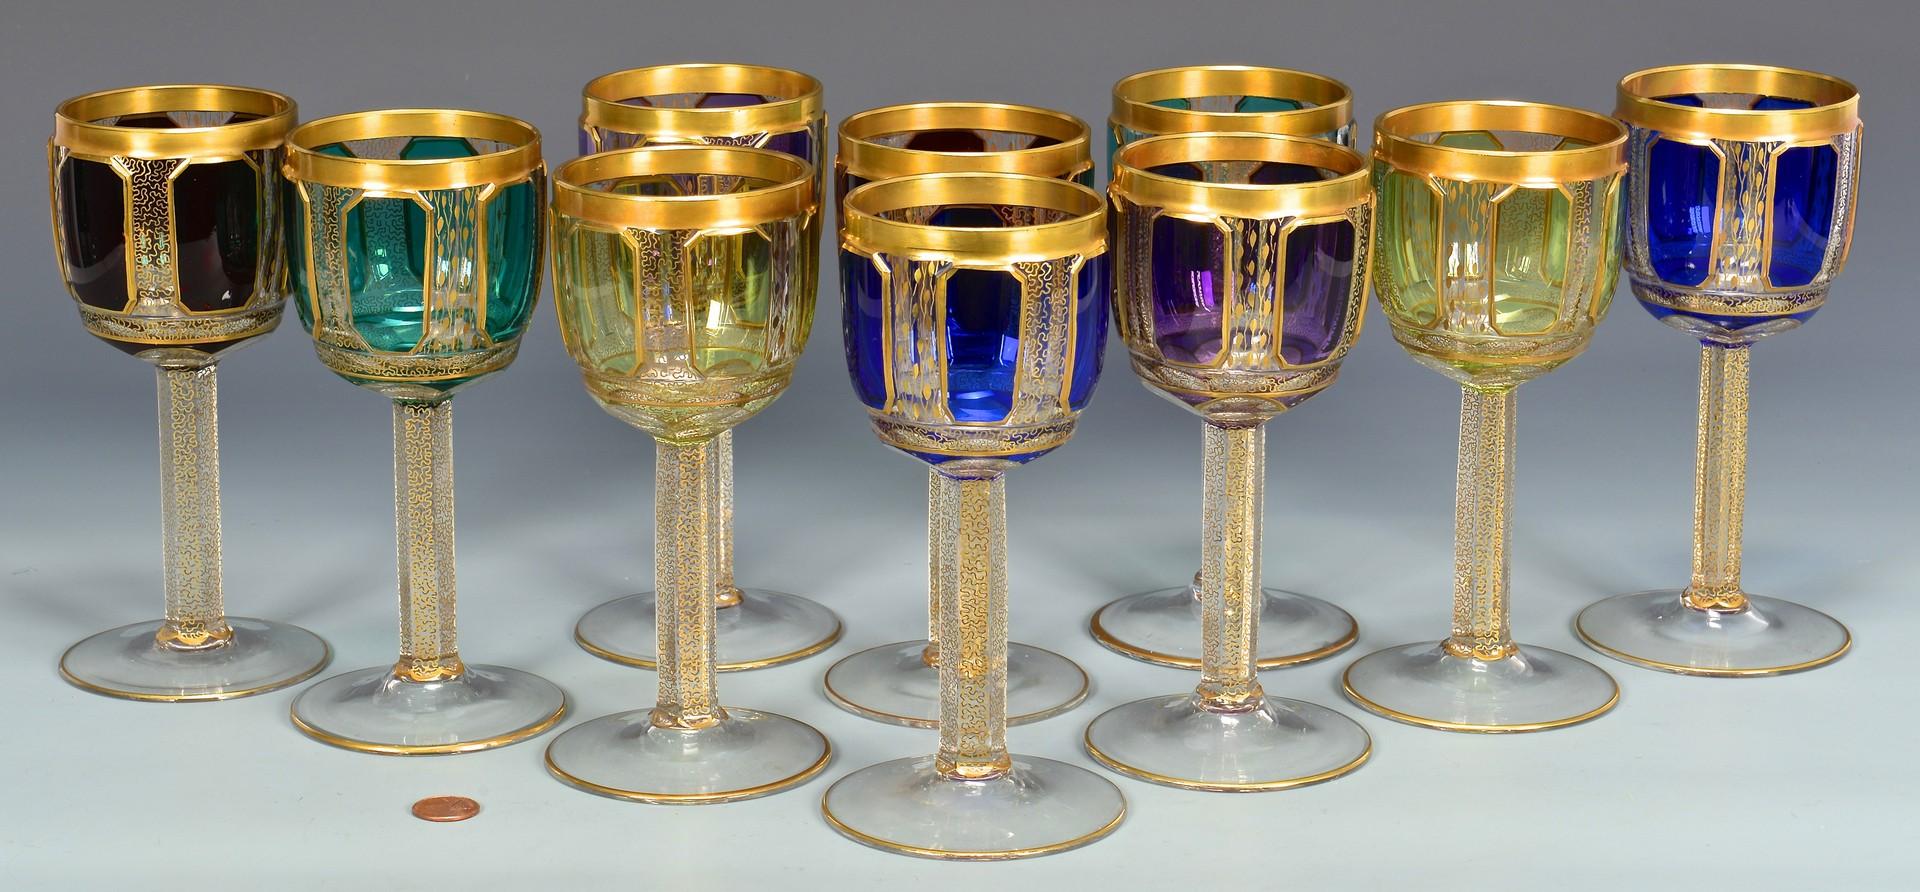 Lot 721: 10 Czech Handblown Colored Goblets